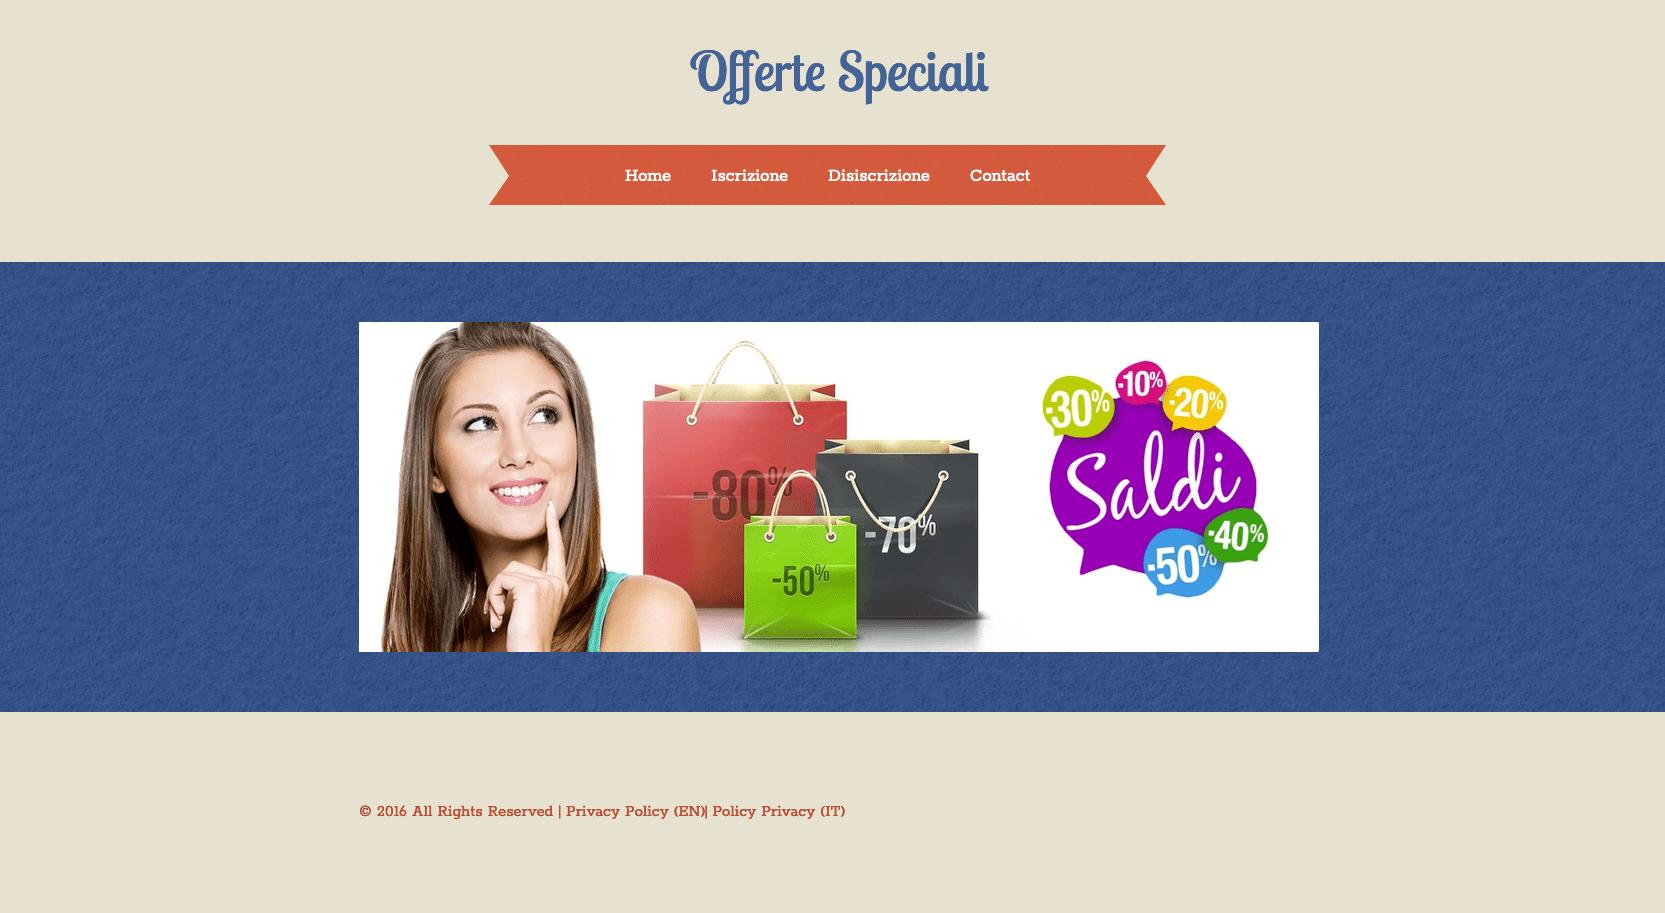 offerteSpeciali_inicio